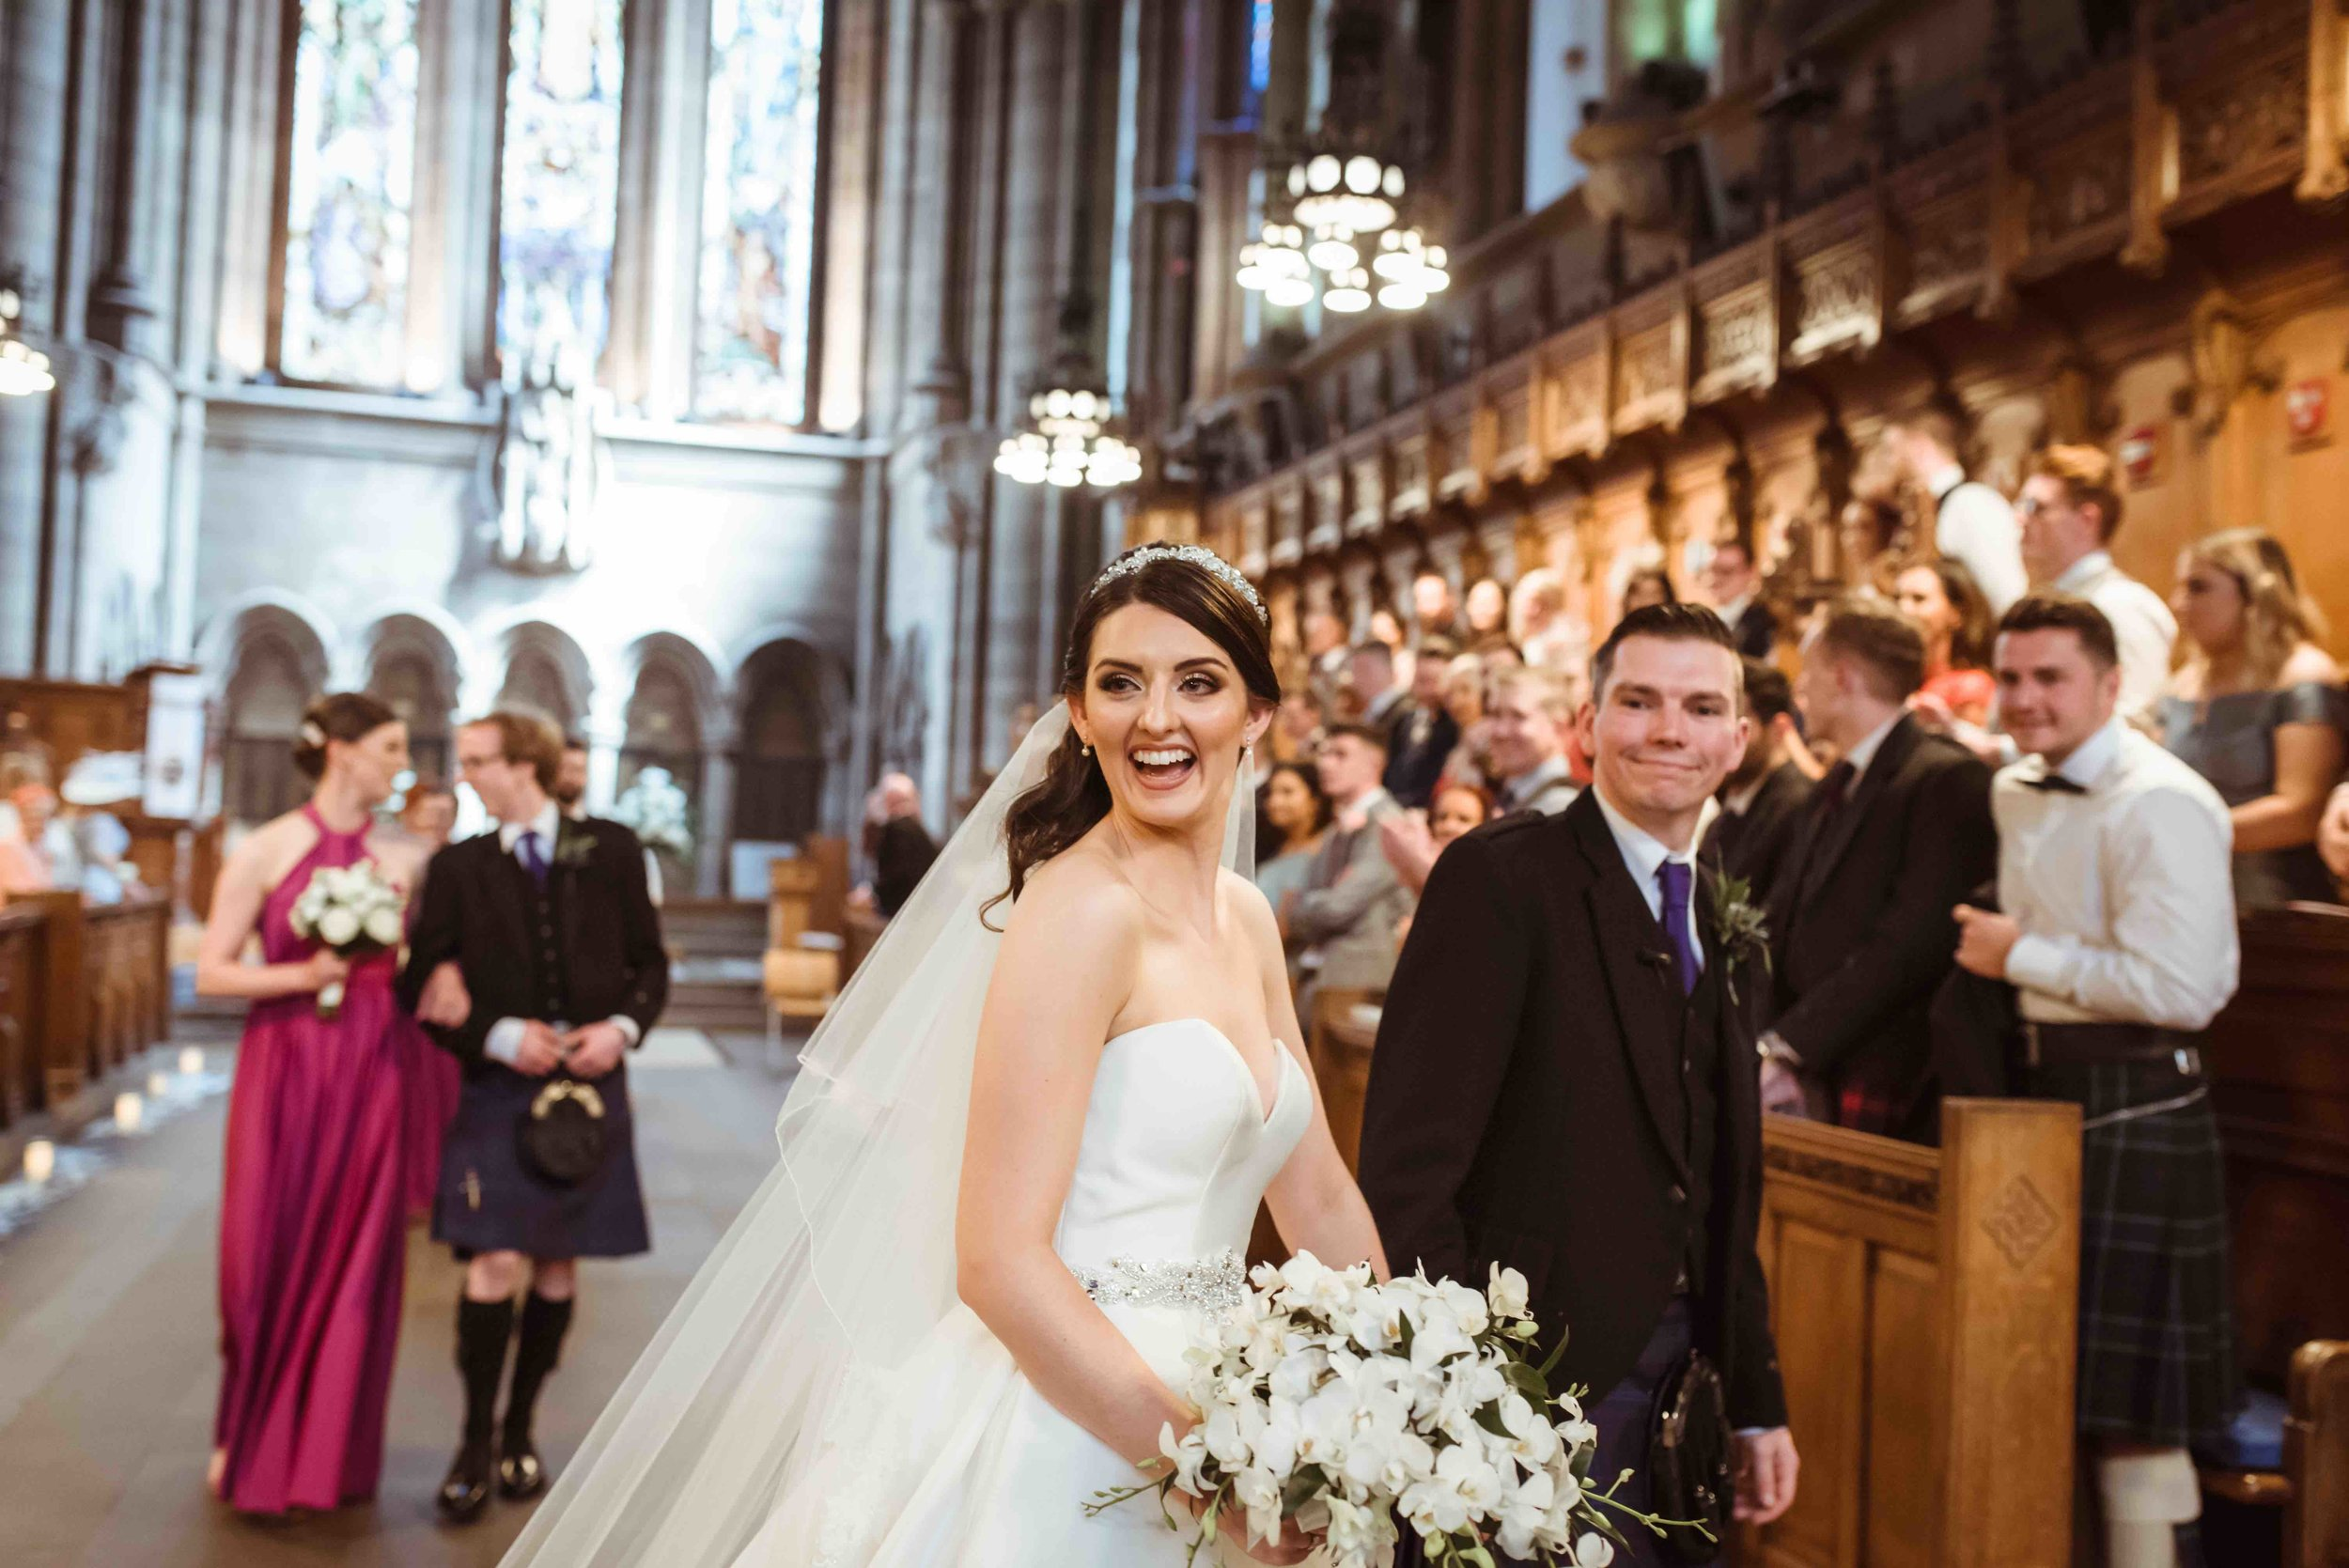 Heather & Paul - Glasgow University Chapel